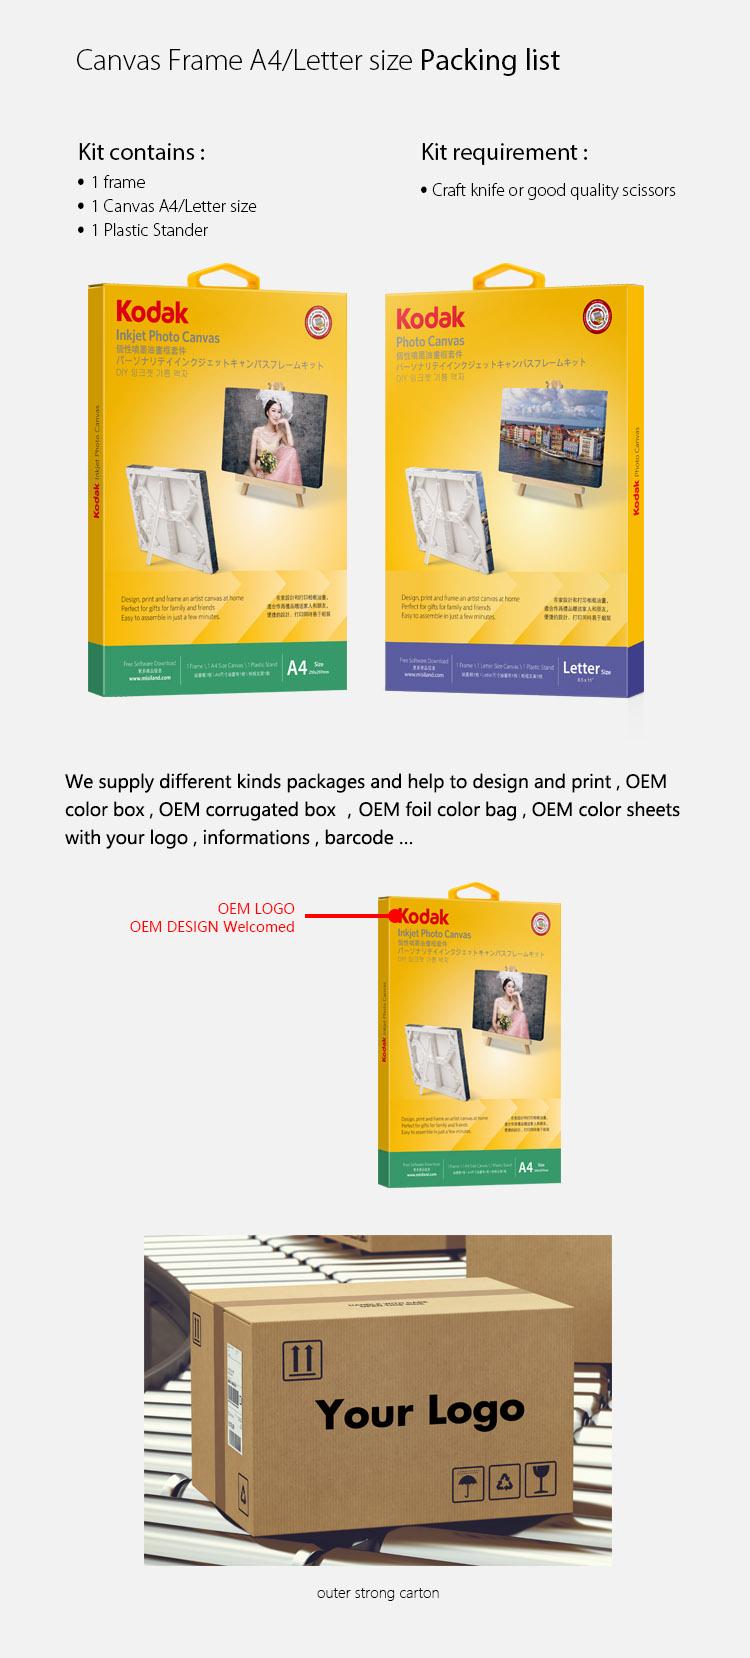 Kodak Lizenzierte Diy Inkjet Photo Leinwand Rahmen - Buy Product on ...